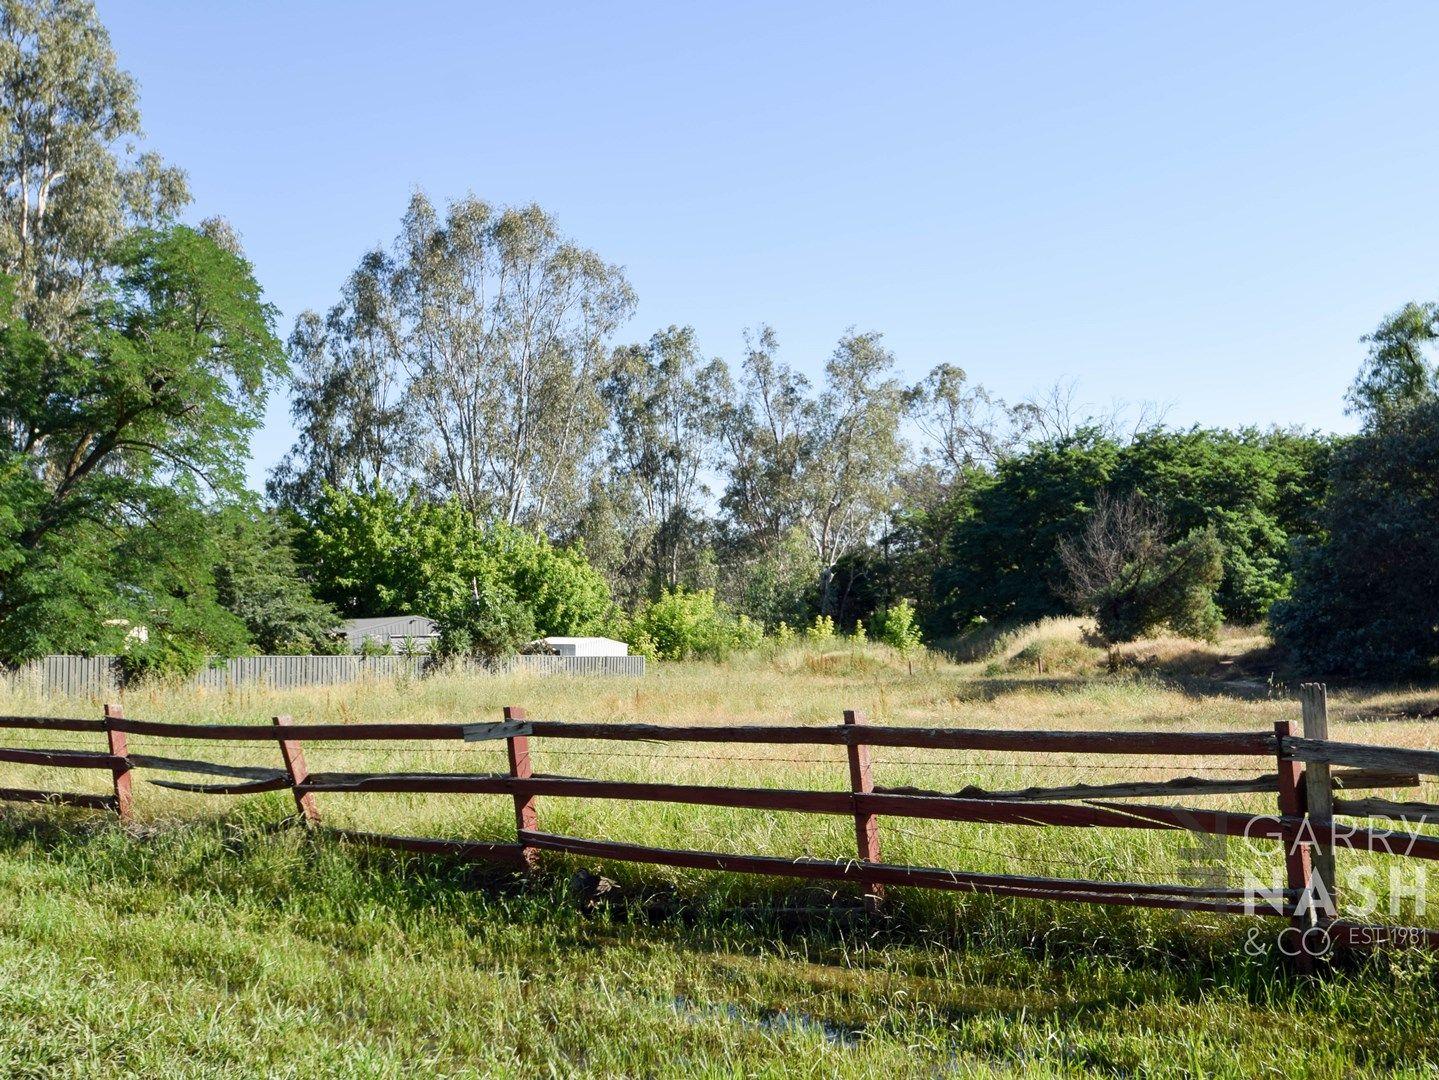 Lot 1/41-55 Wilson Road, Wangaratta VIC 3677, Image 0